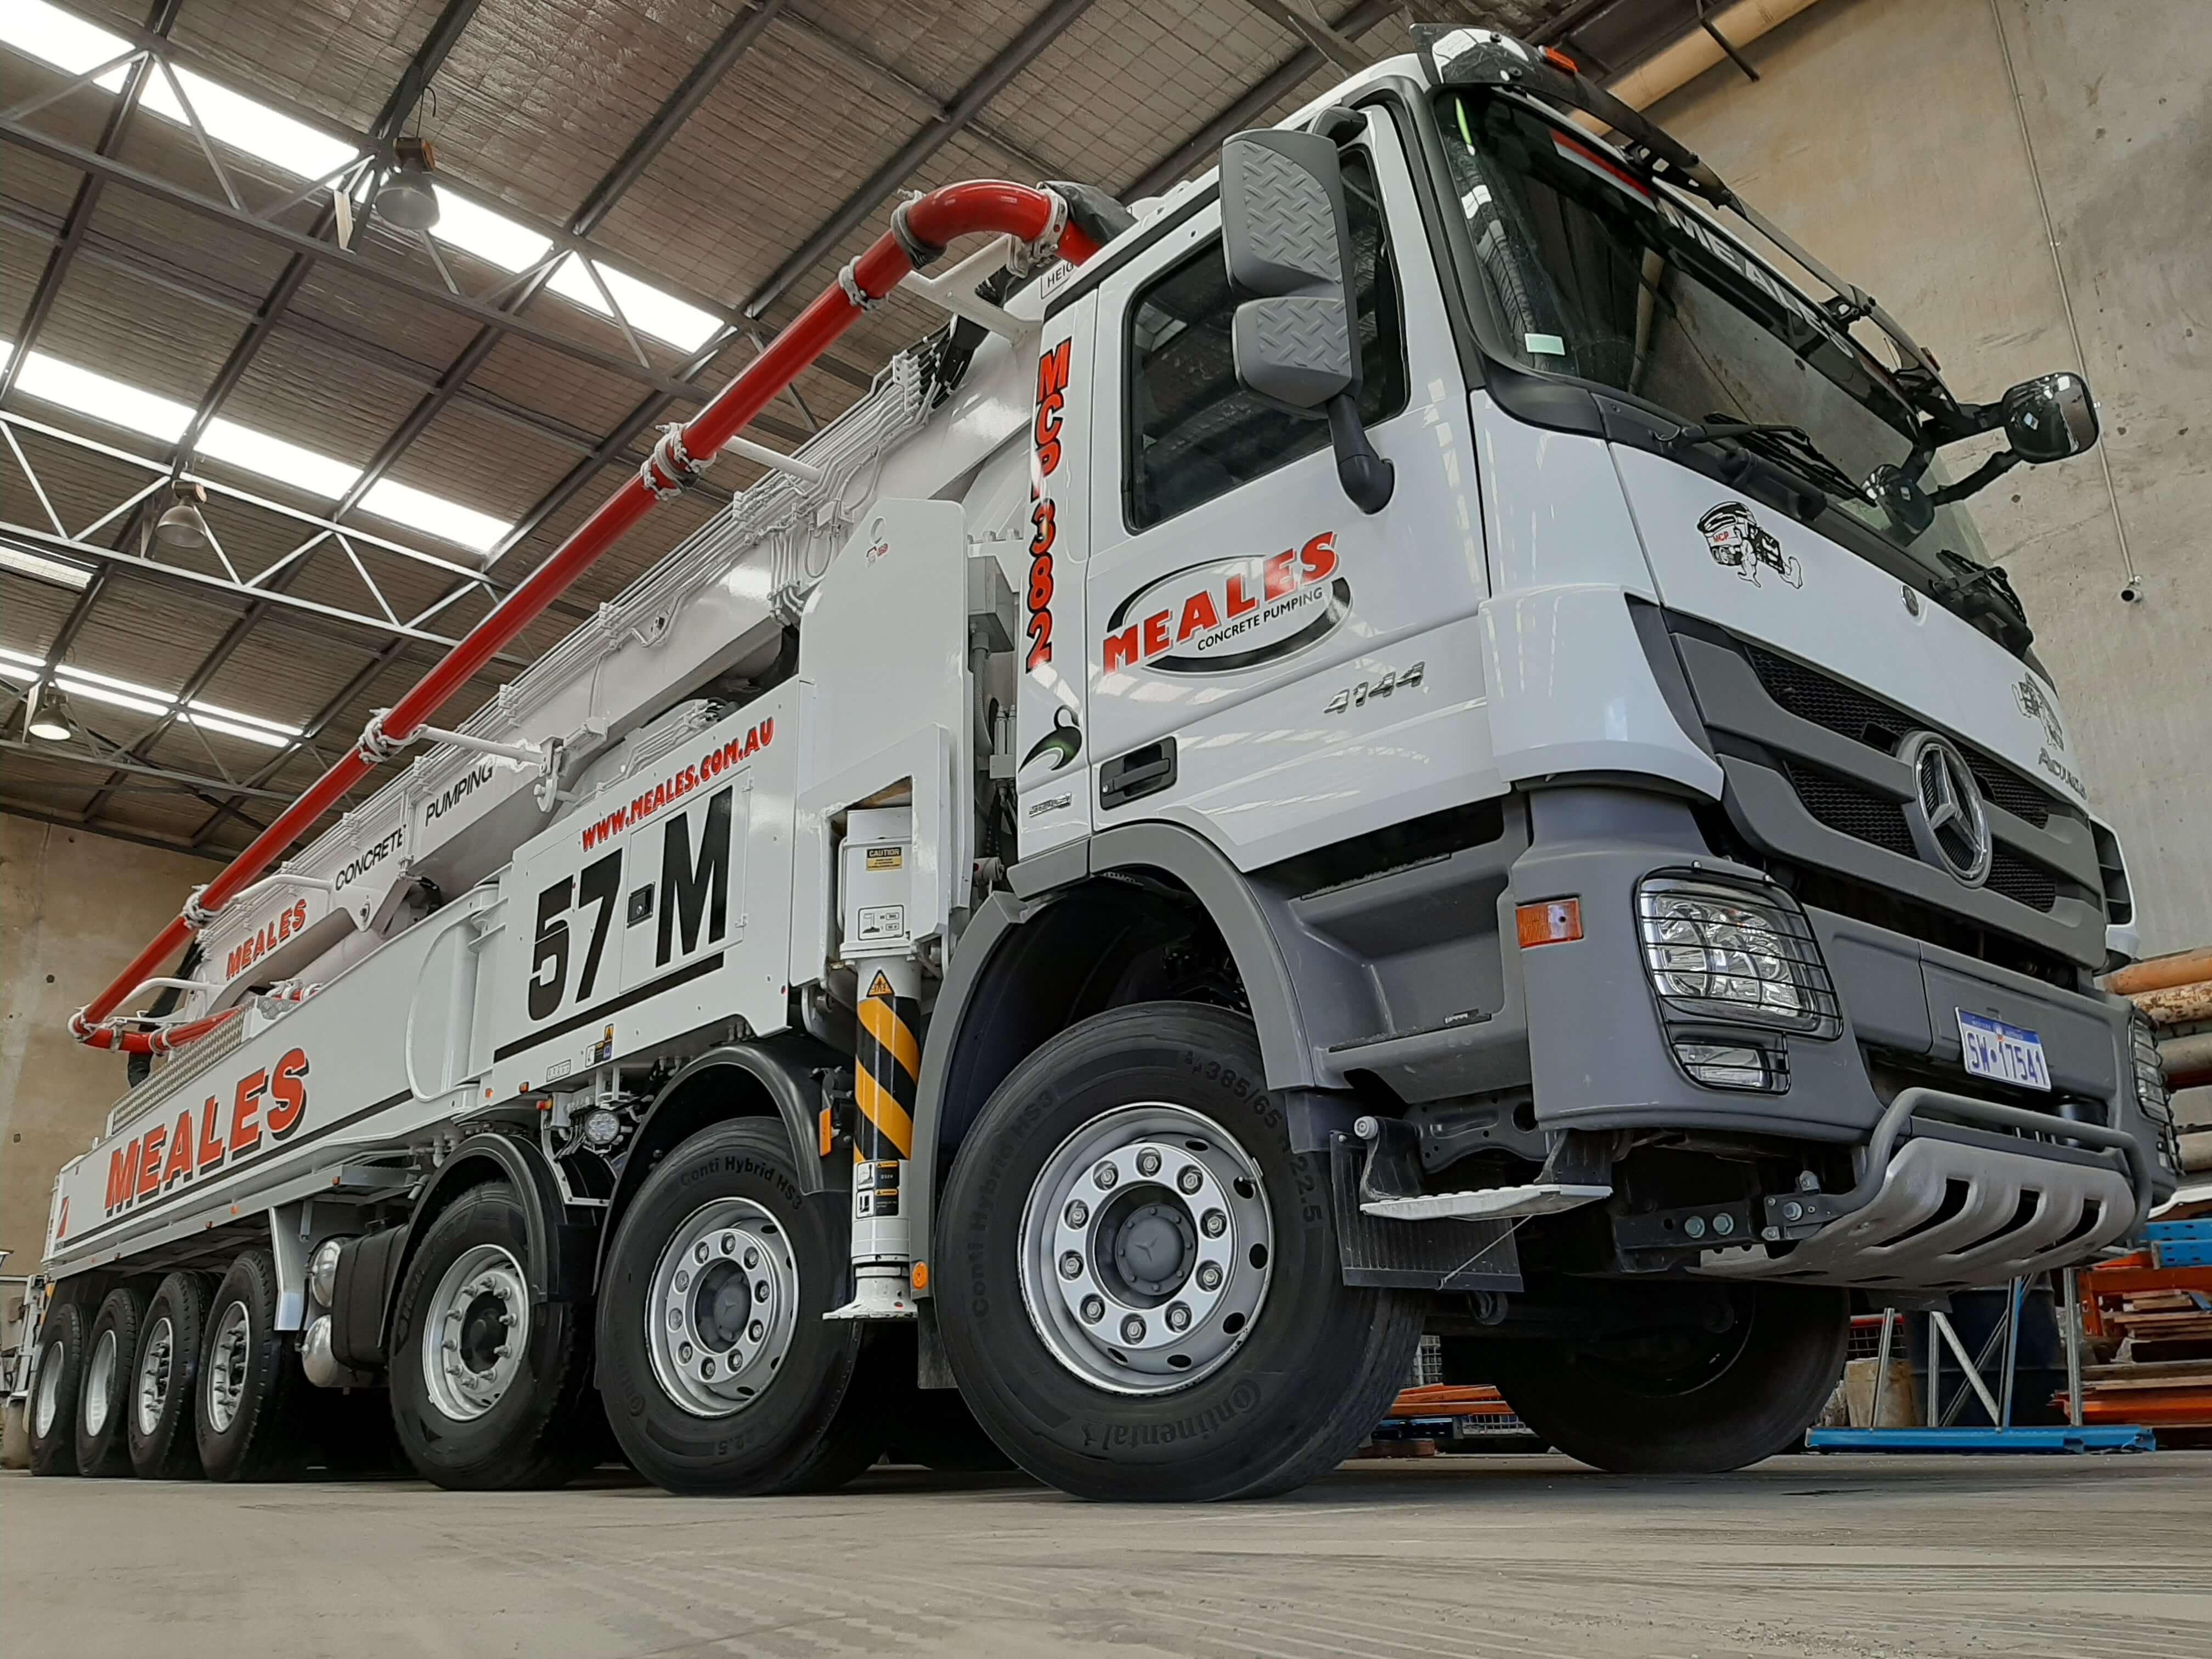 meales-concrete-pumping-boom-pump-truck-57m